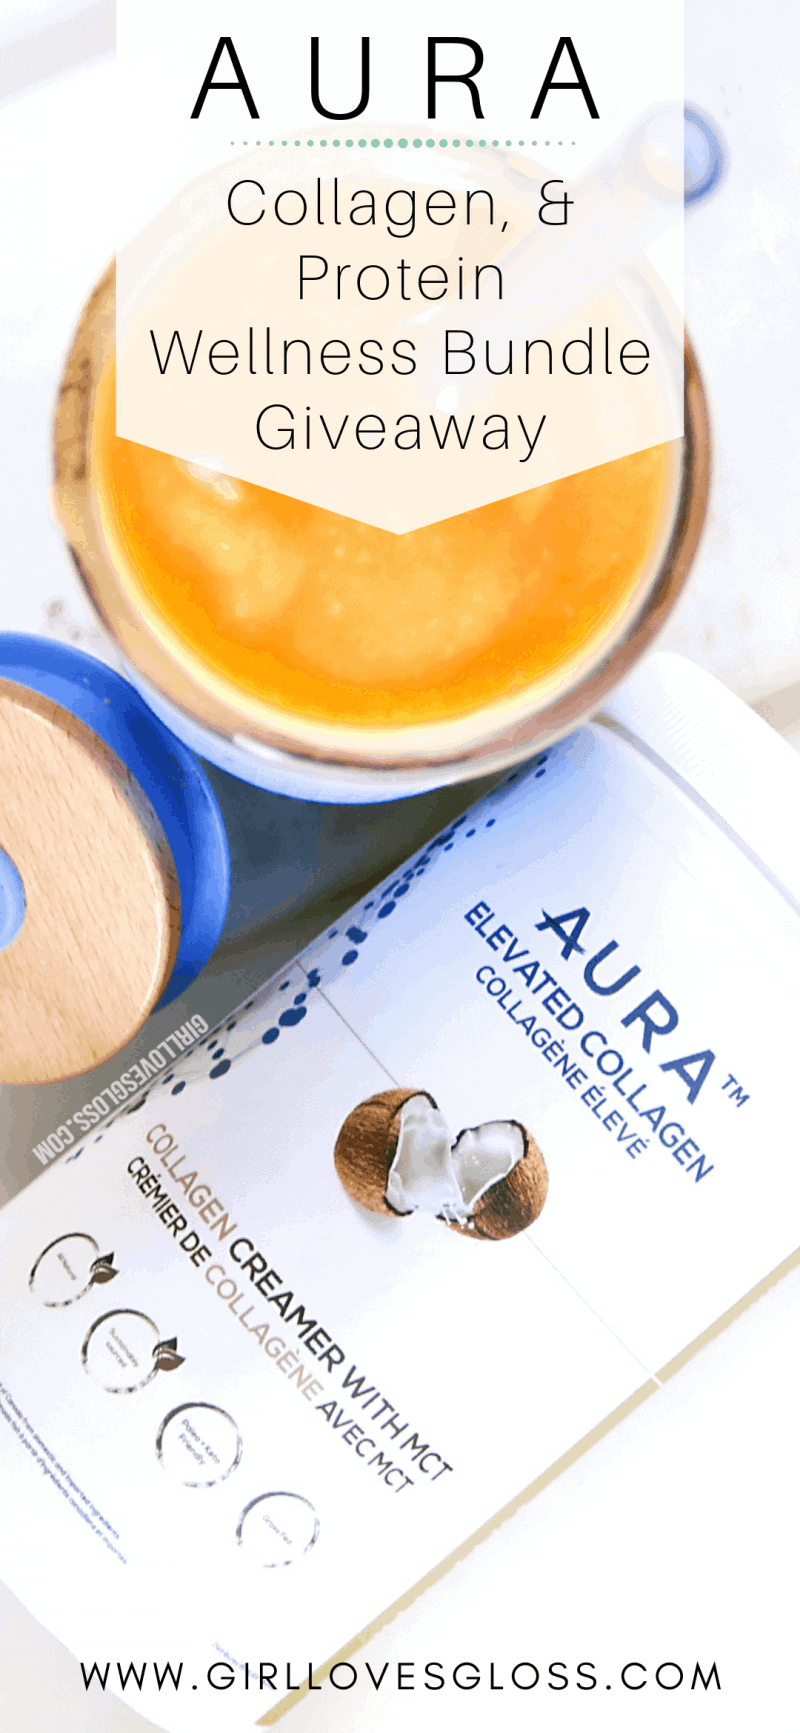 AURA Collagen and Protein Wellness Bundle Giveaway